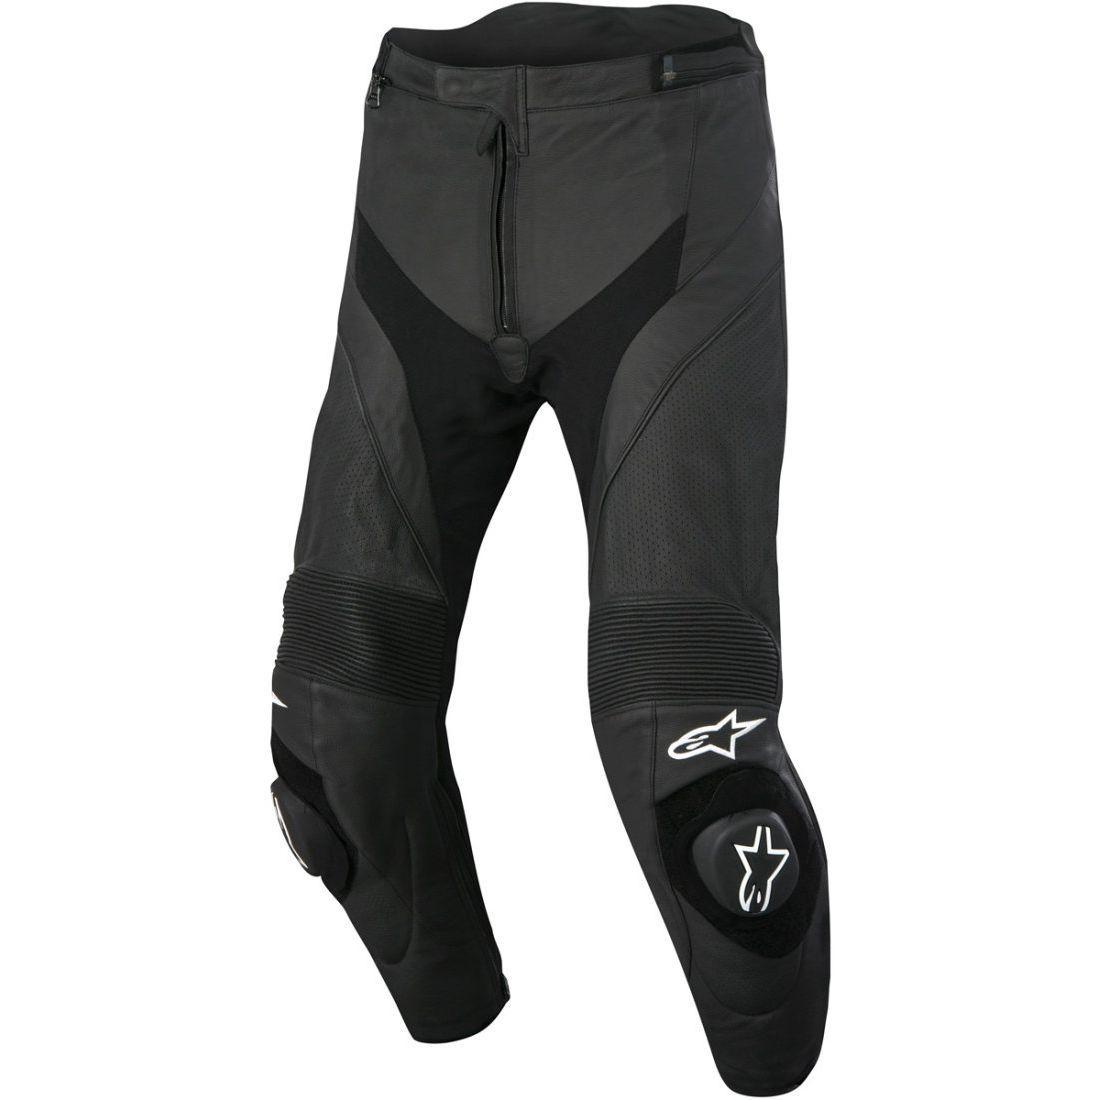 Pantalon de moto Alpinestars Missile - Black/Anthracite